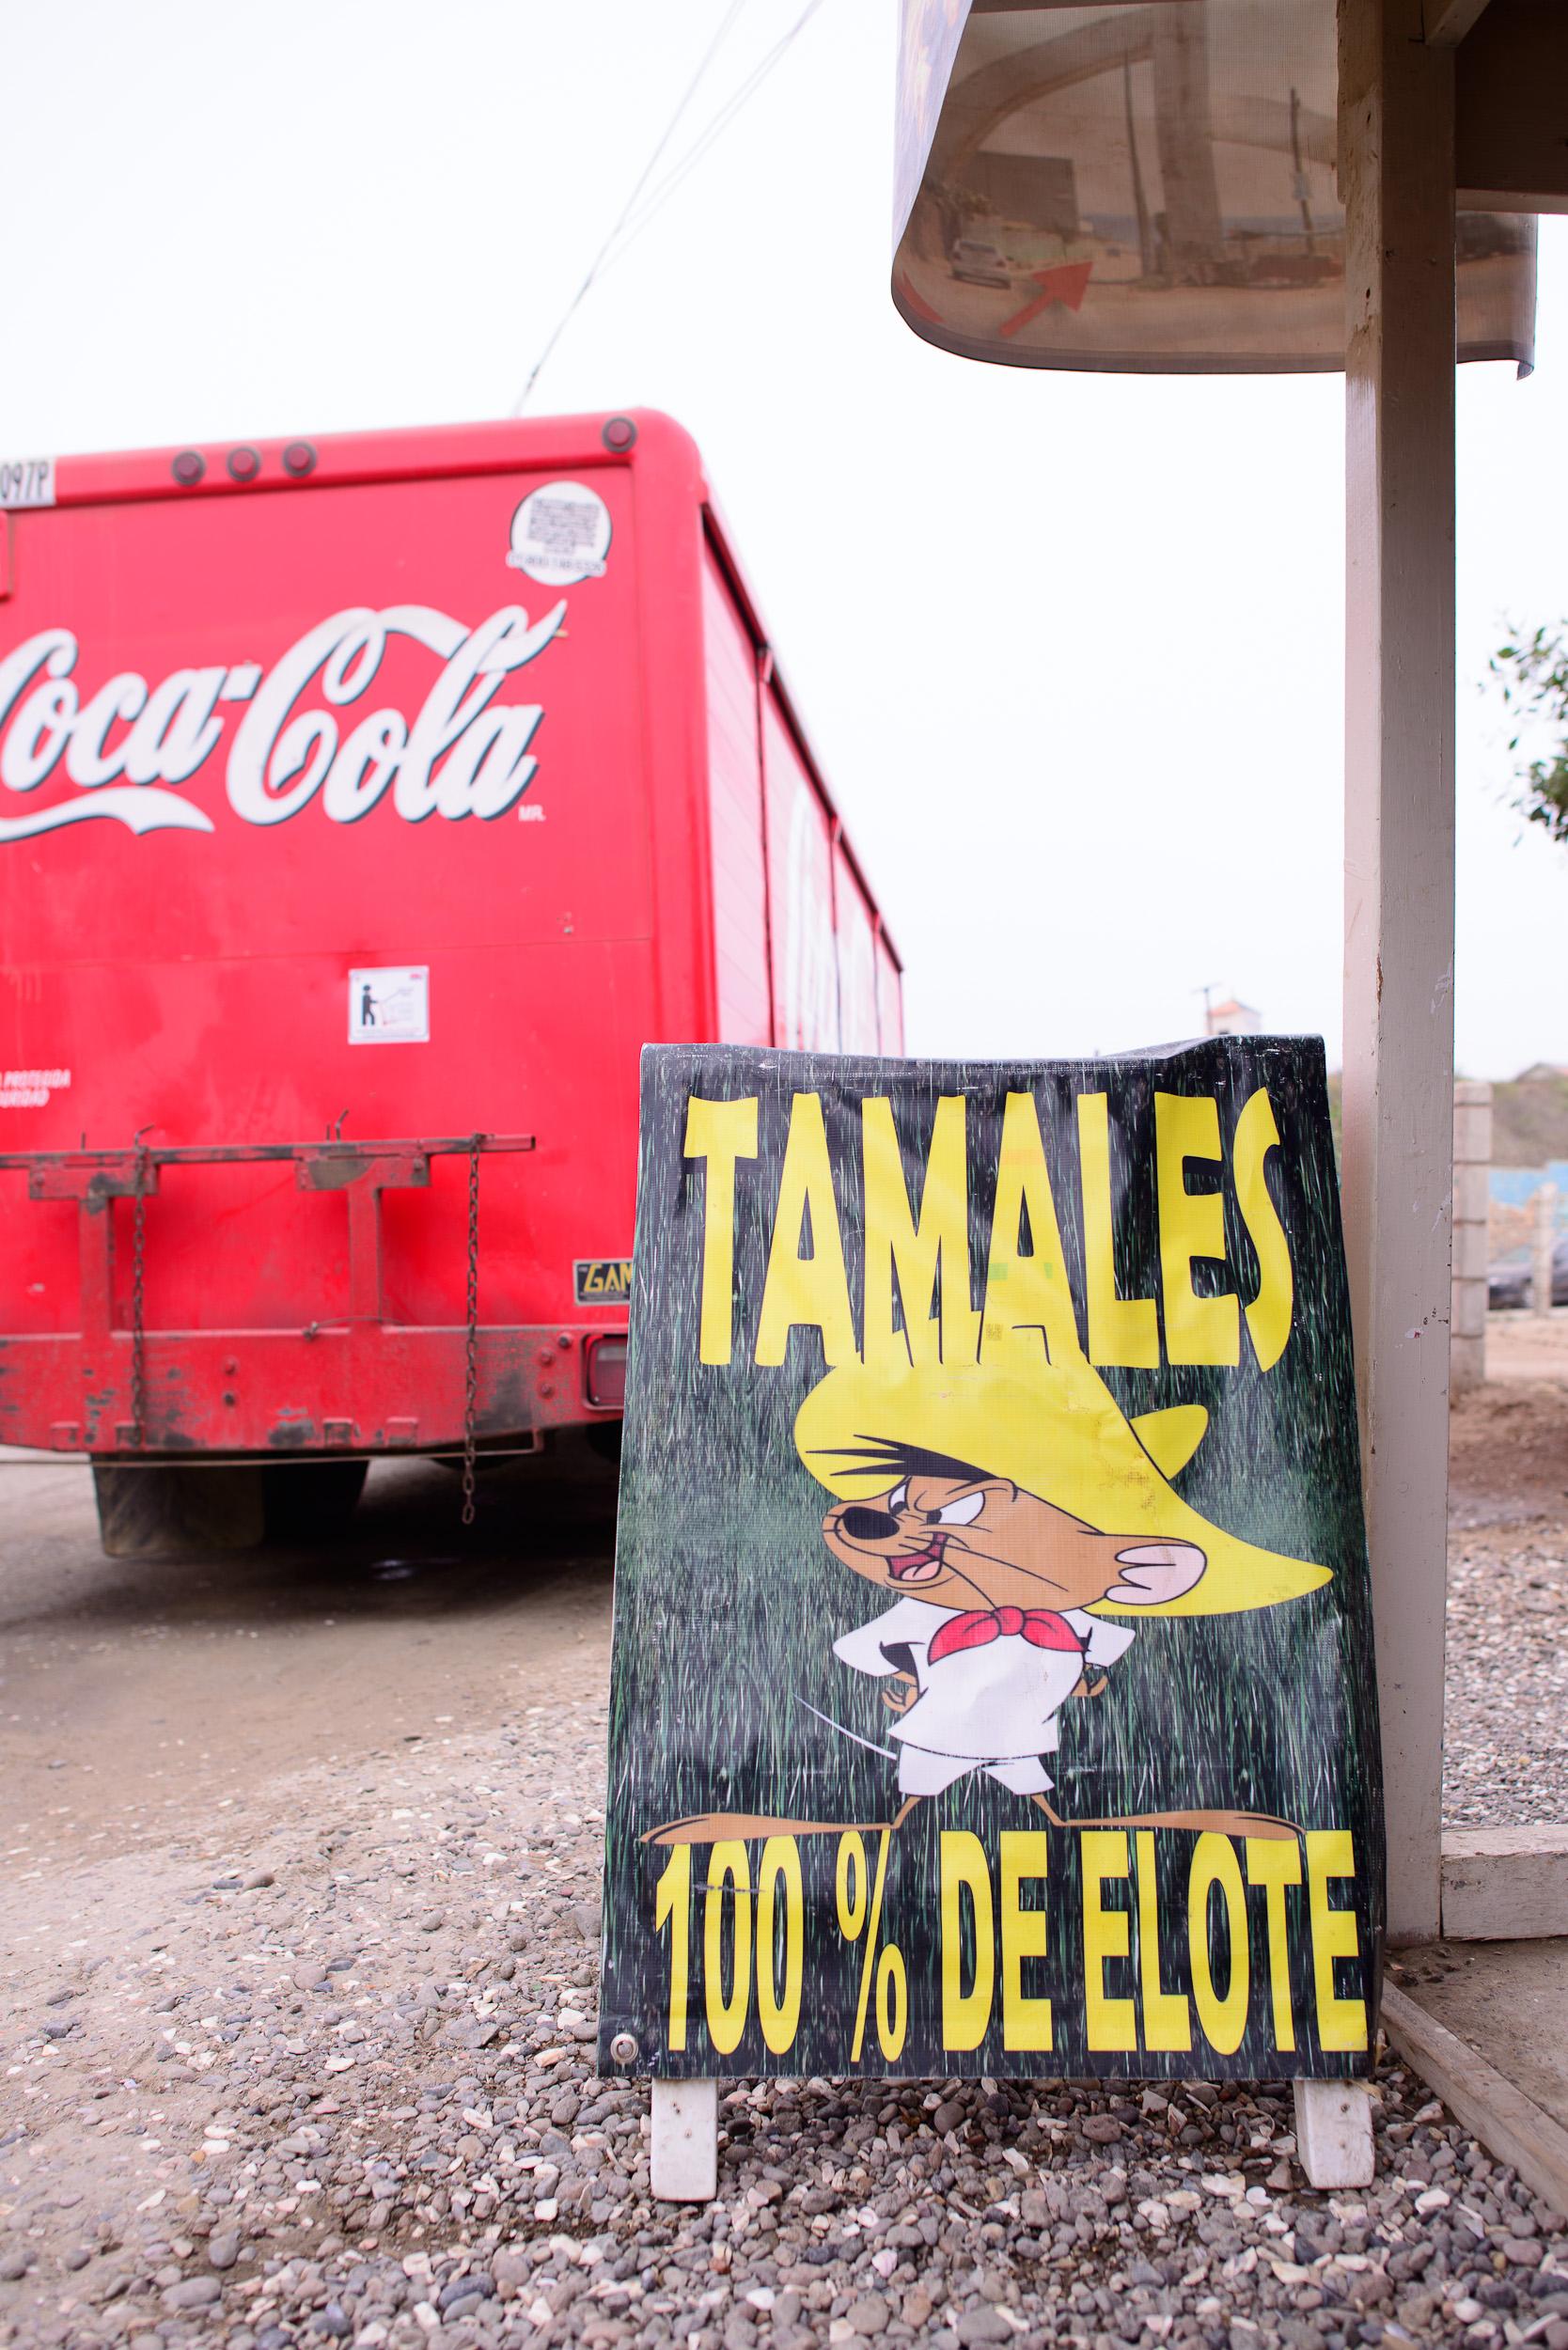 Tamales 100% de elote